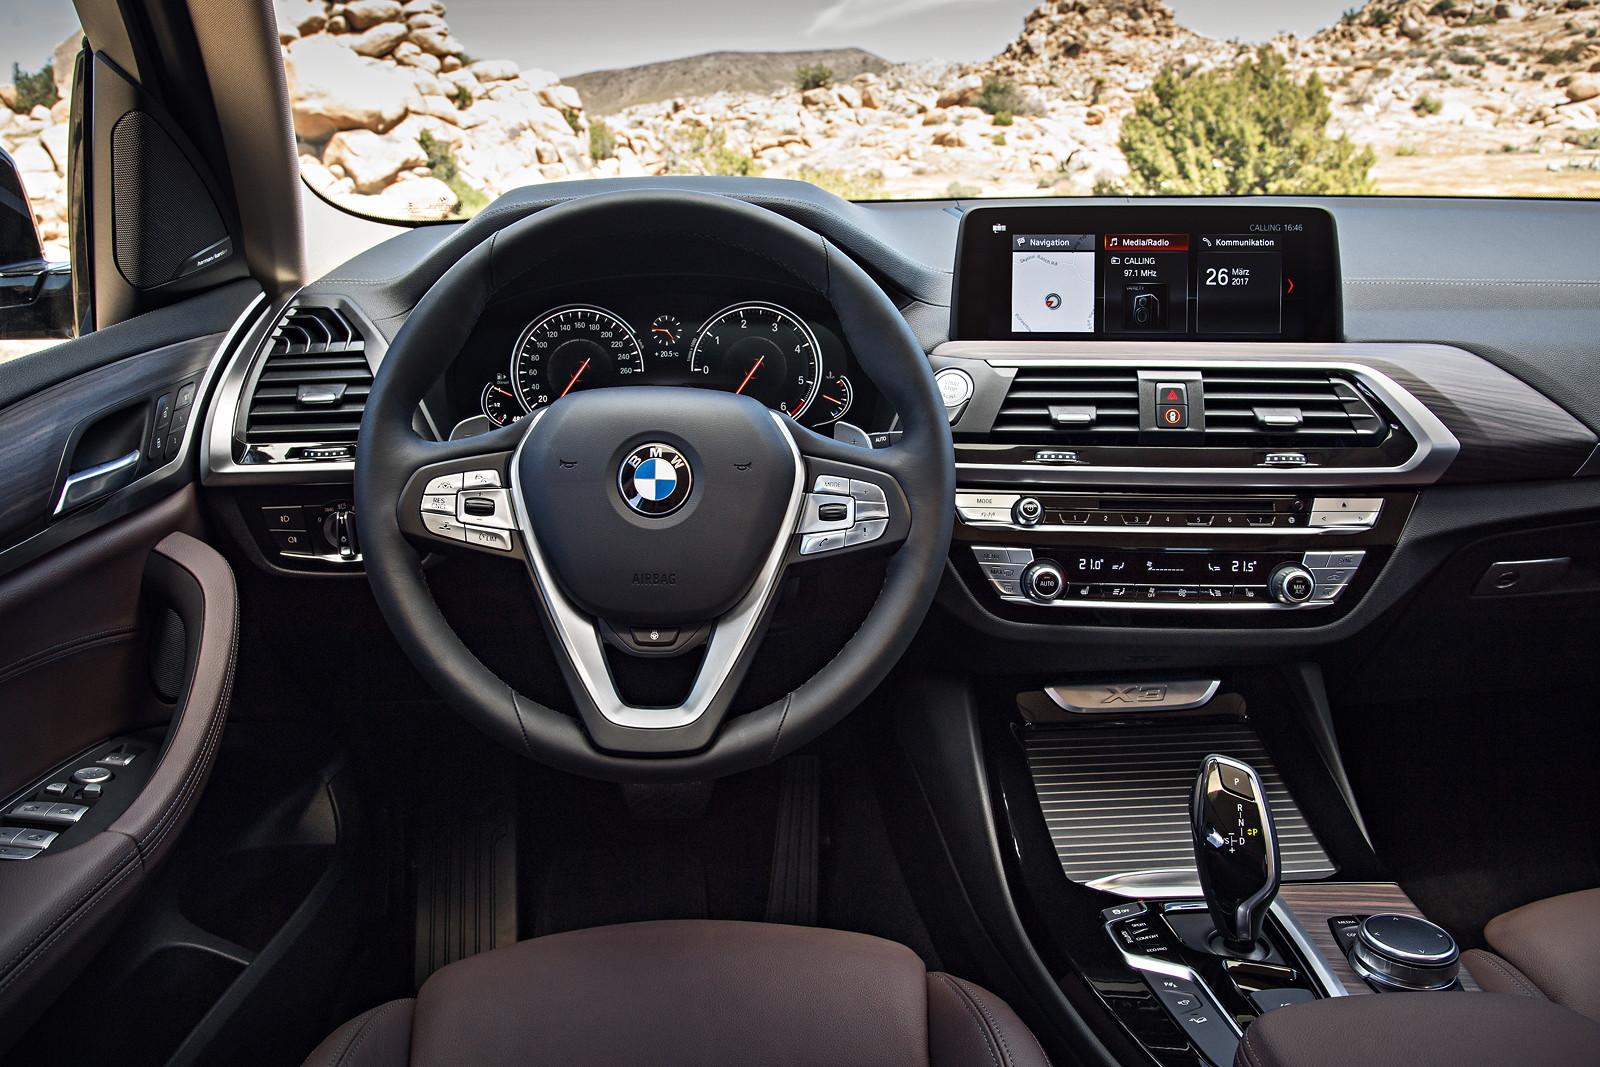 Foto: BMW X3 xDrive30d xLine, Interieur, Polsterung: Leder Vernasca ...